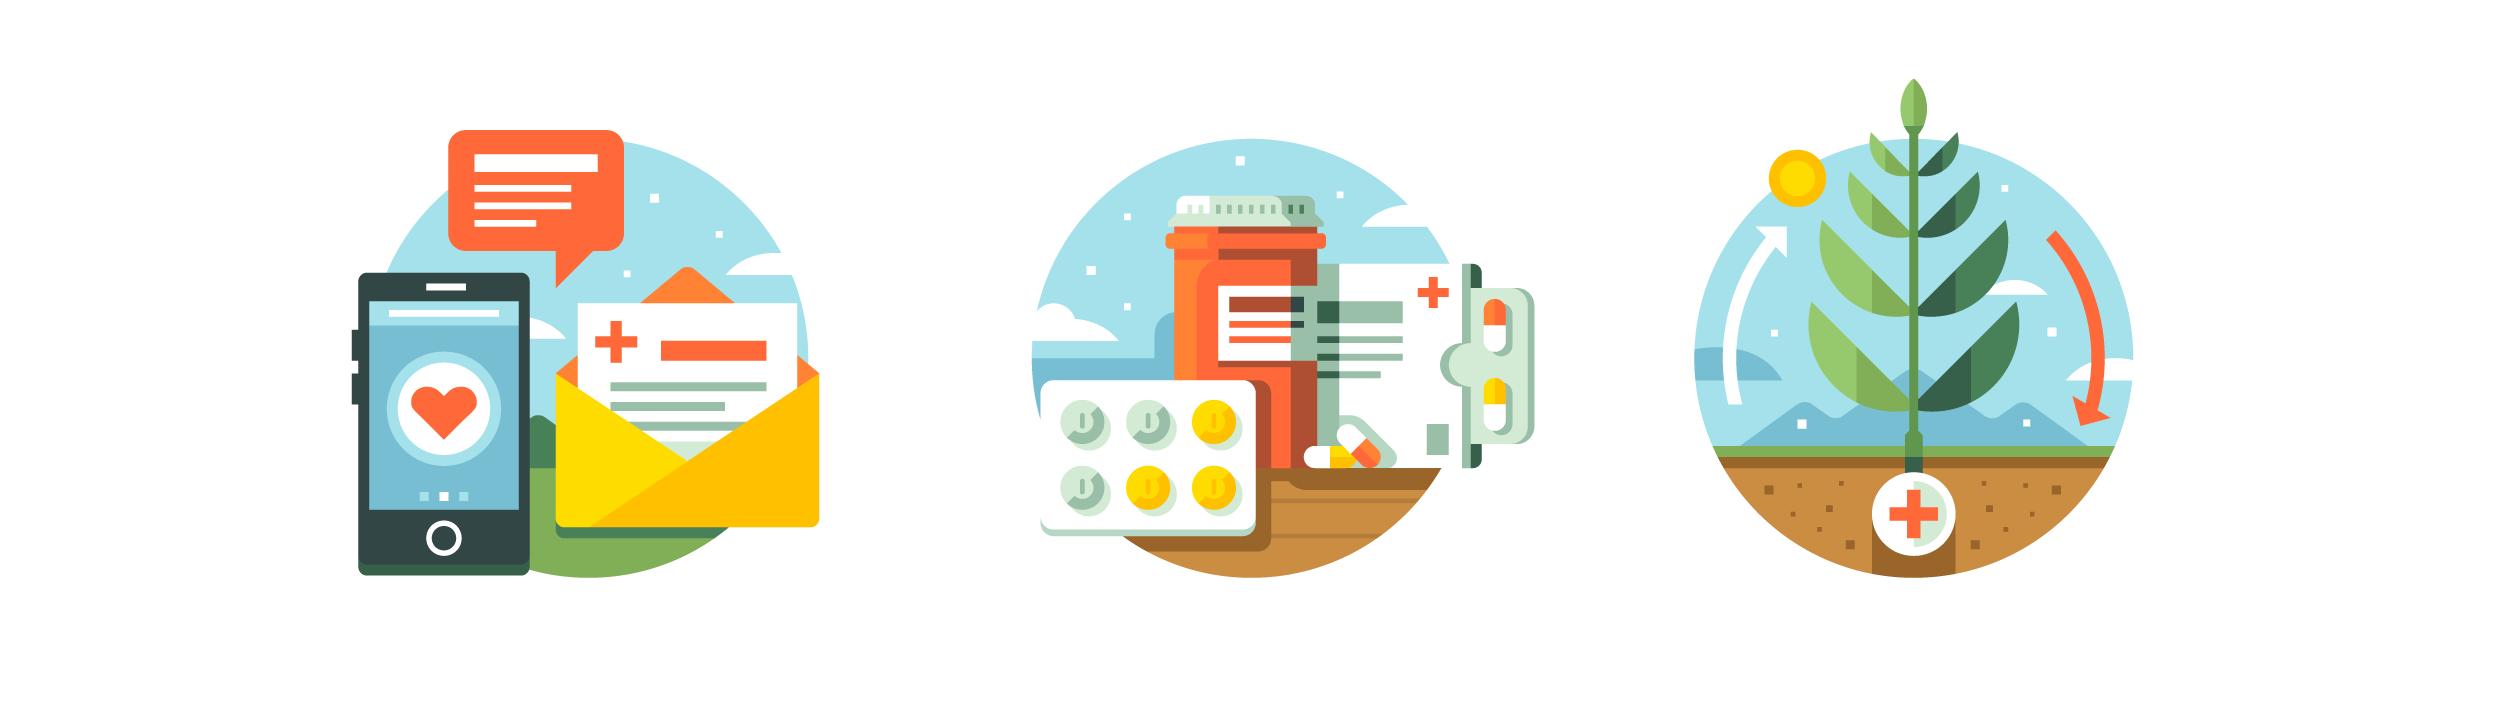 CSS Healthcare Website Illustrations by Matt Anderson - Healthcare Spot Illustrations